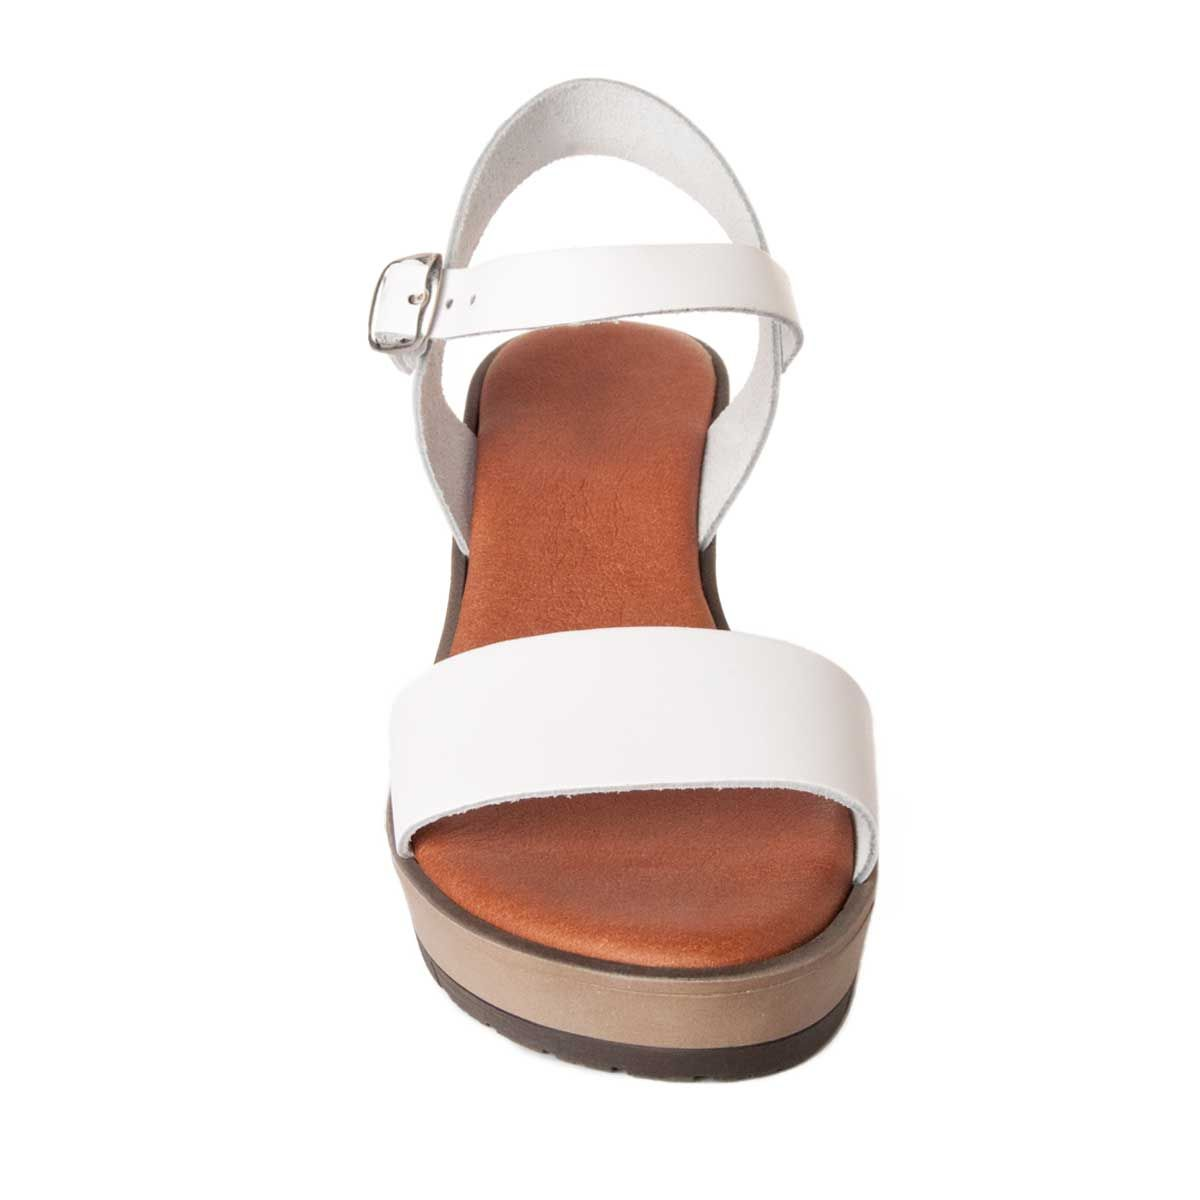 Leindia Wedge Sandal in White